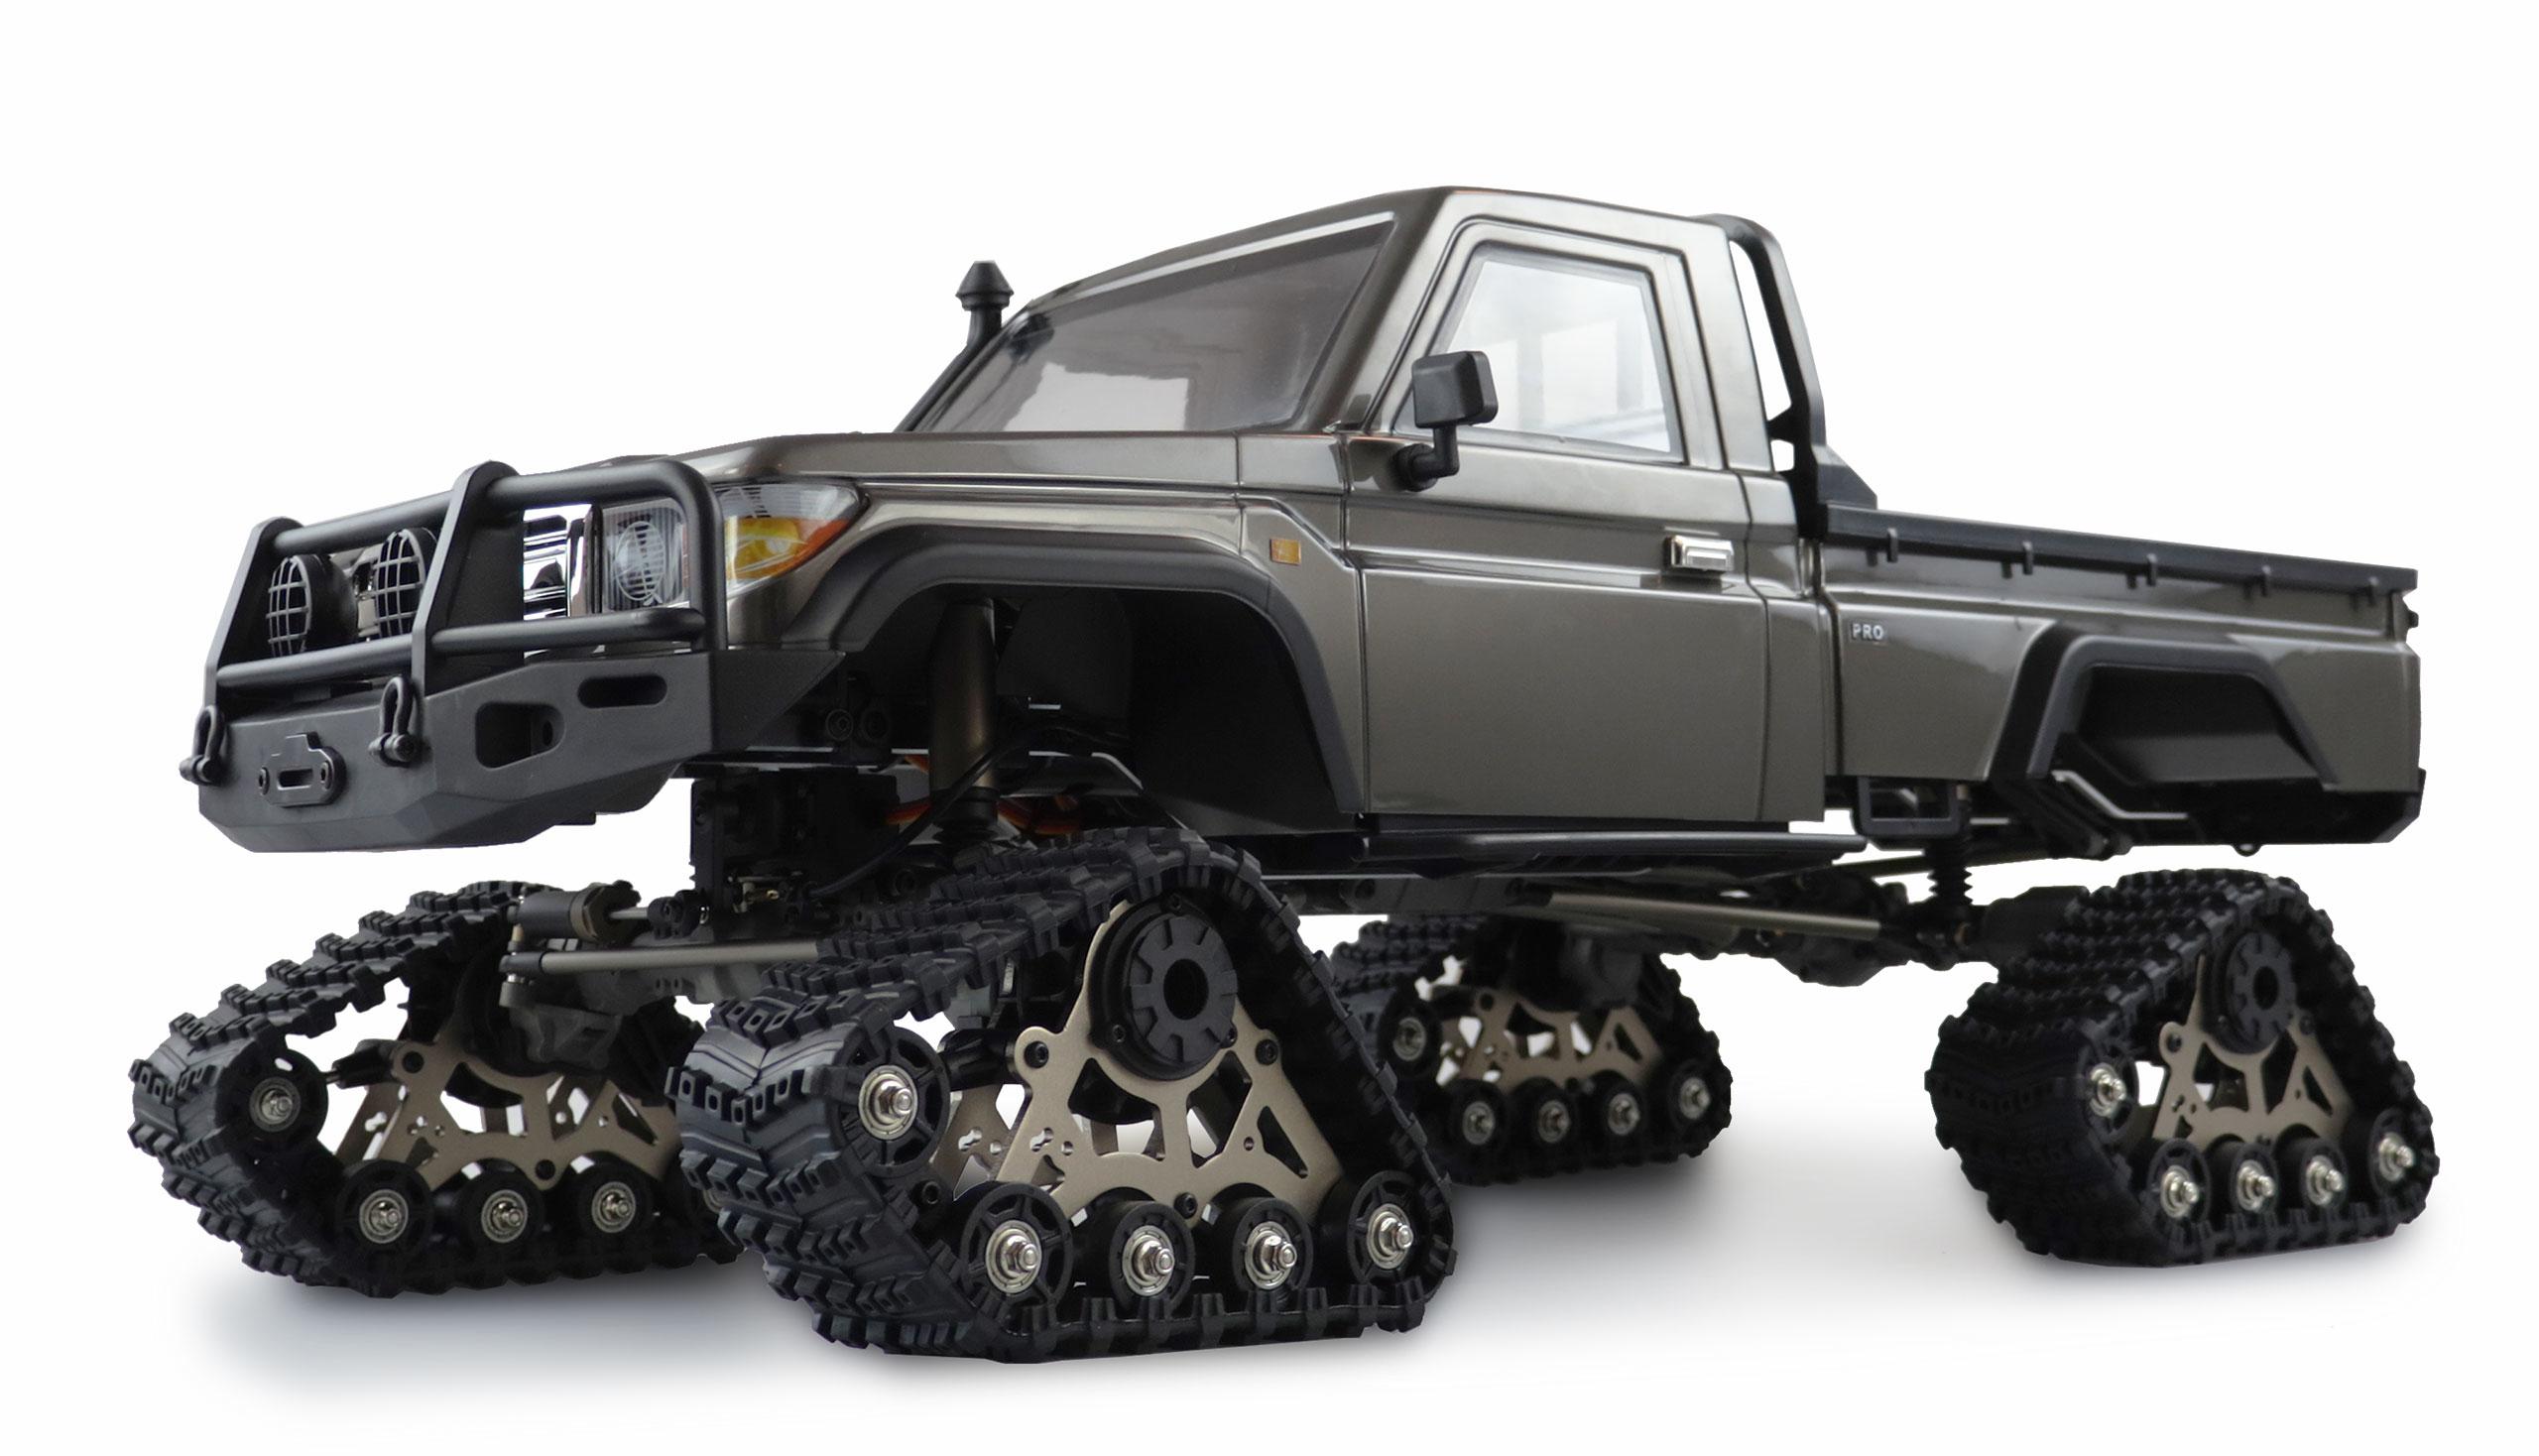 Amewi AMXROCK RCX8PT - Off-Road-Wagen - Elektromotor - 1:8 - Fahrbereit (RTD) - Grau - Metall